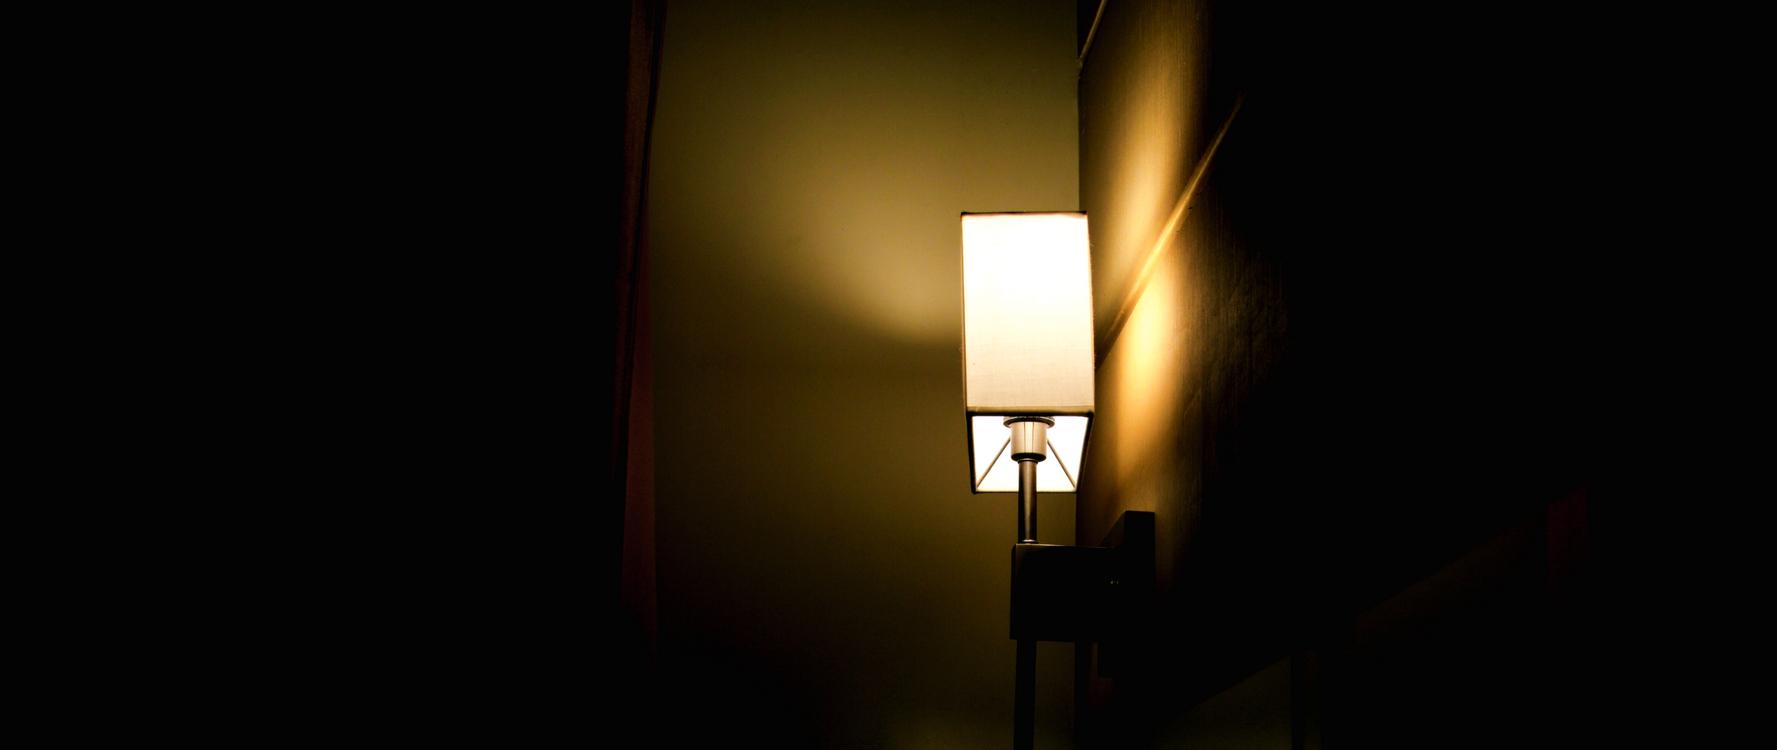 Street Light,Decor,Darkness